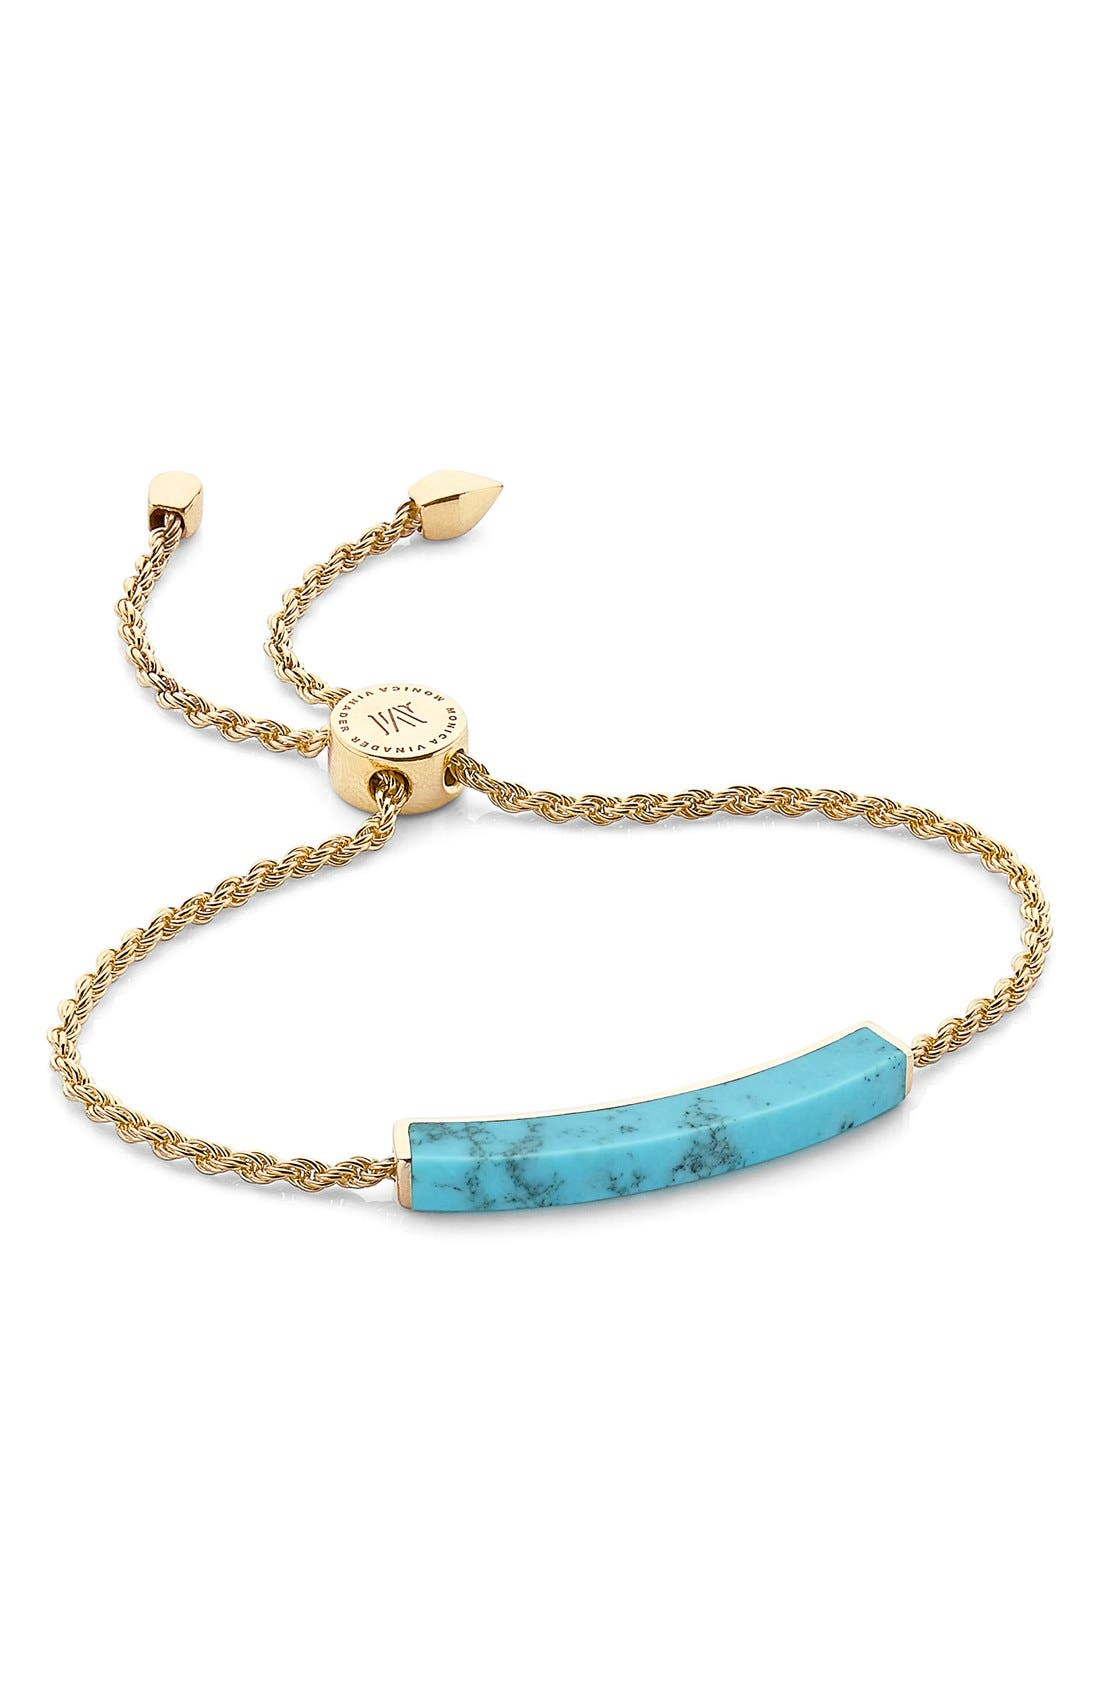 Linear Semiprecious Stone Bracelet,                         Main,                         color, Gold/ Turquoise